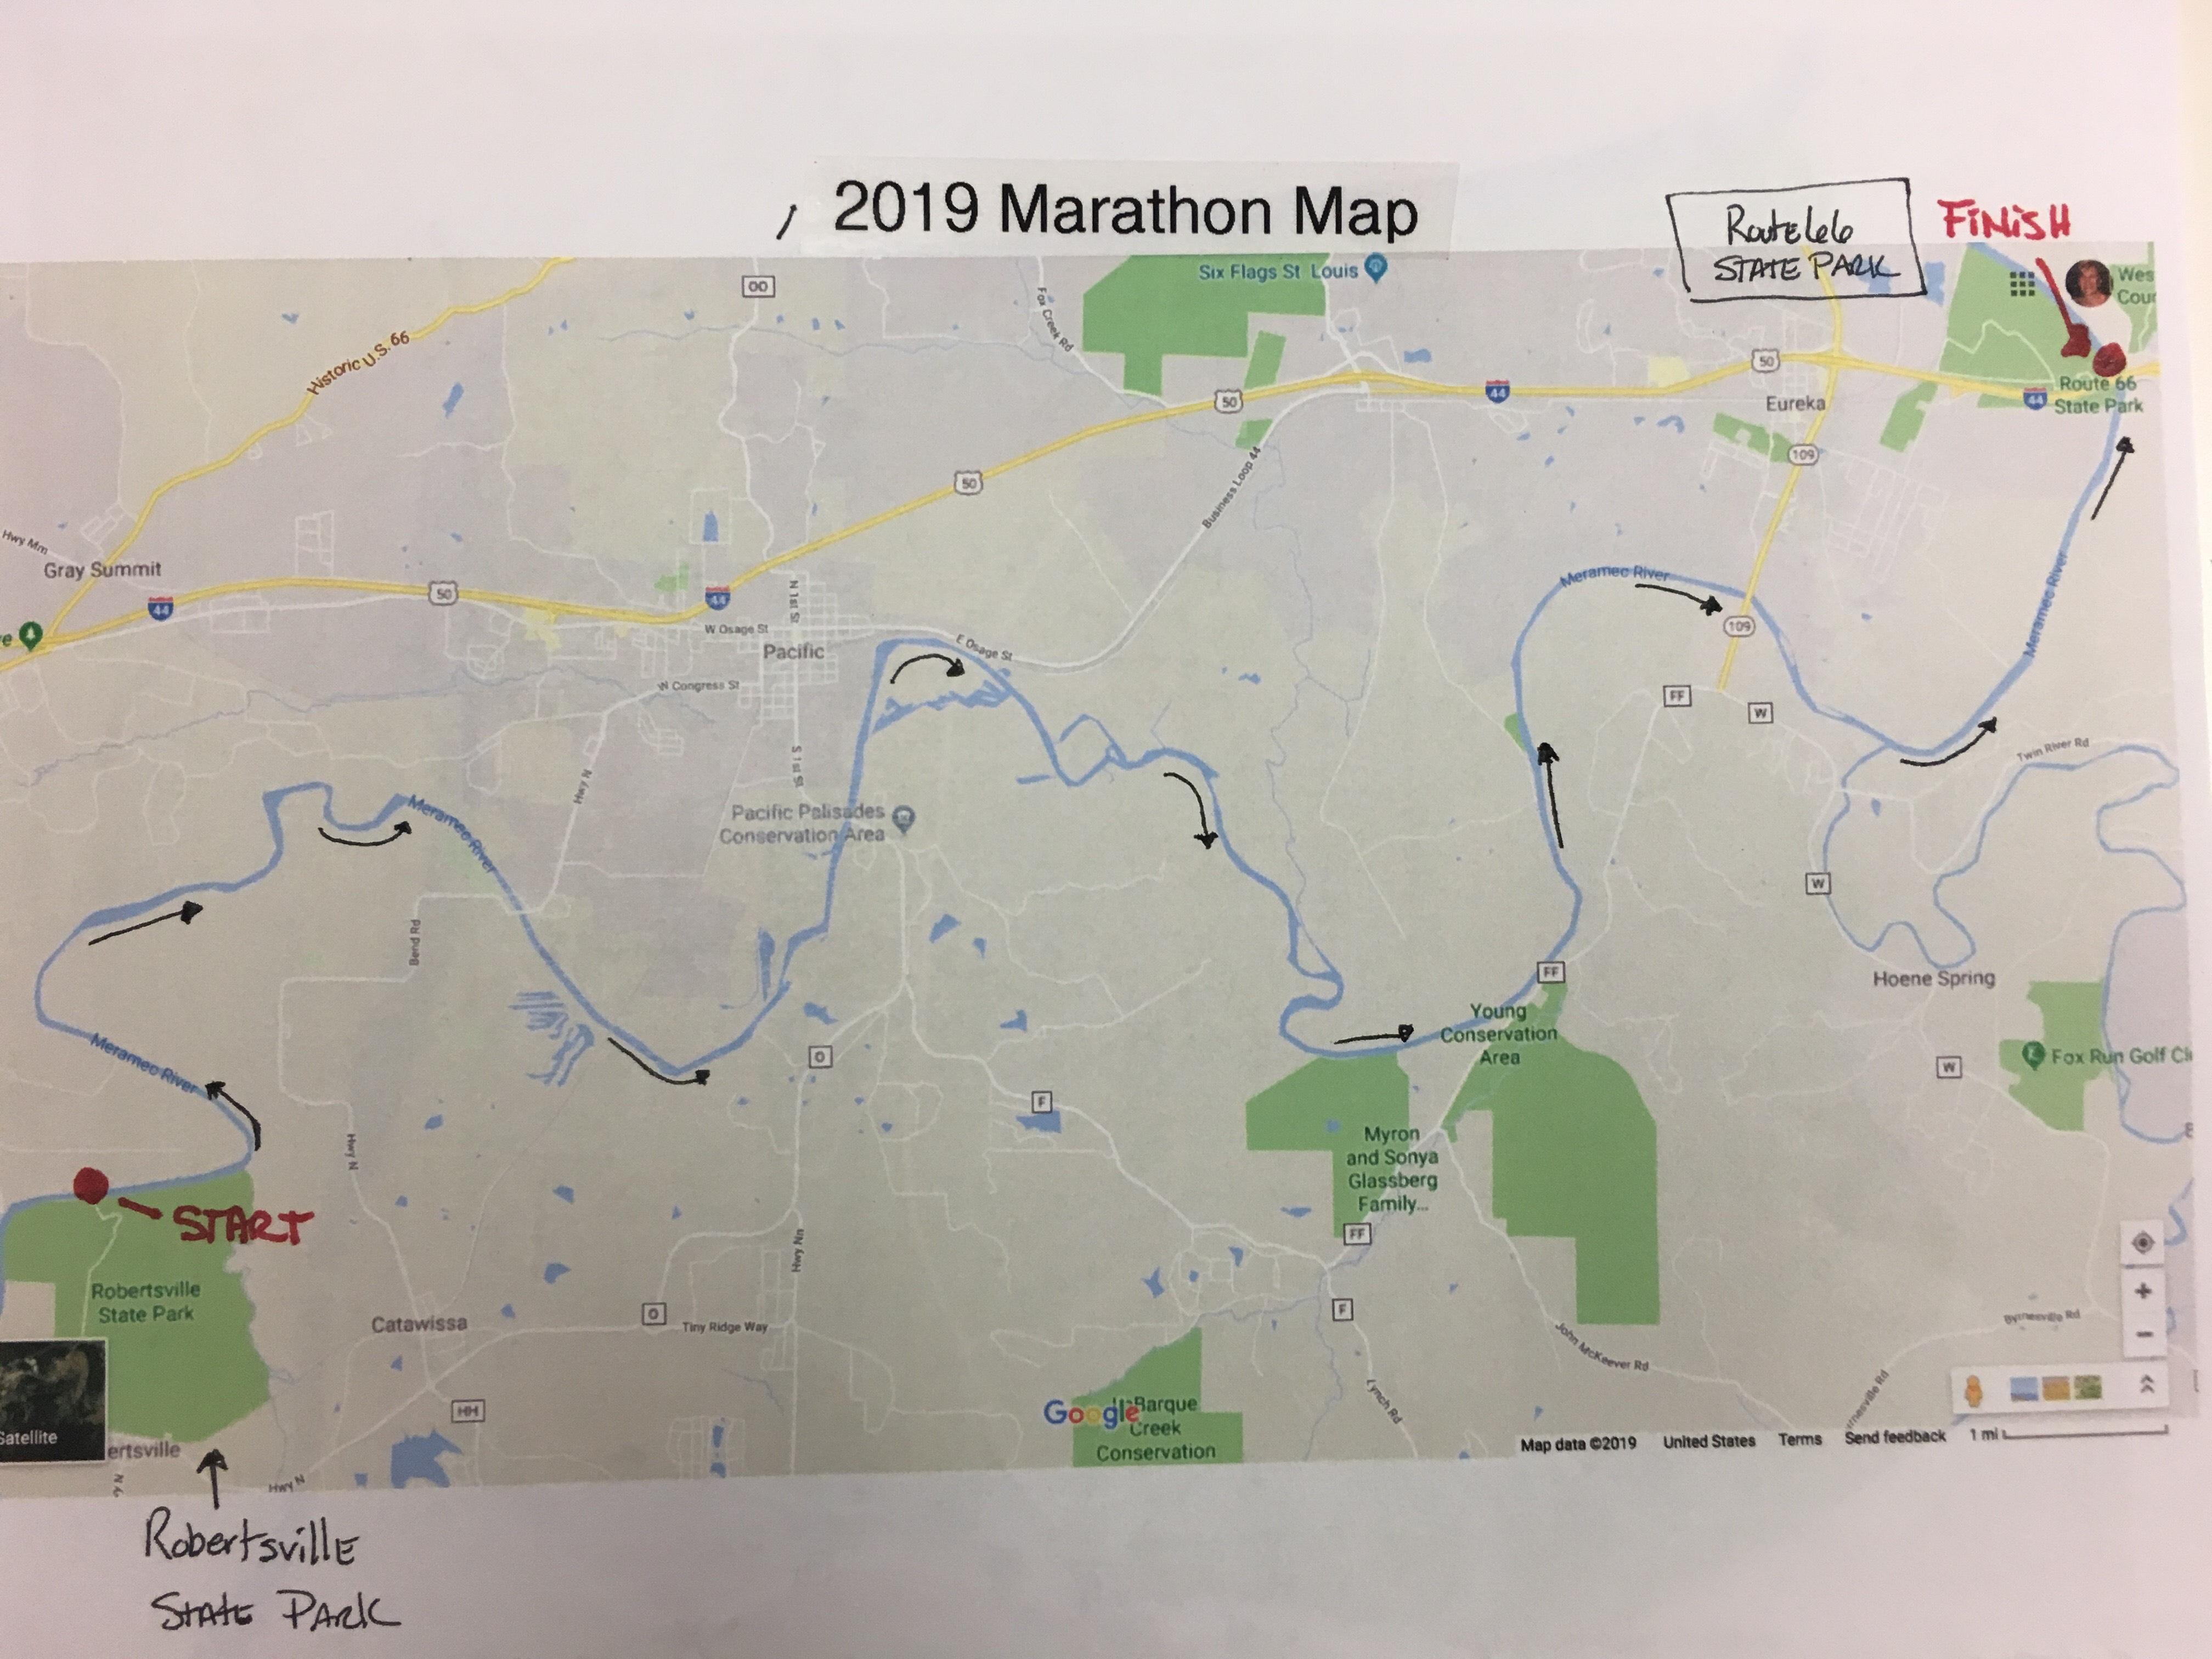 19 - KW - RACE - Meramec Marathon Paddle Race